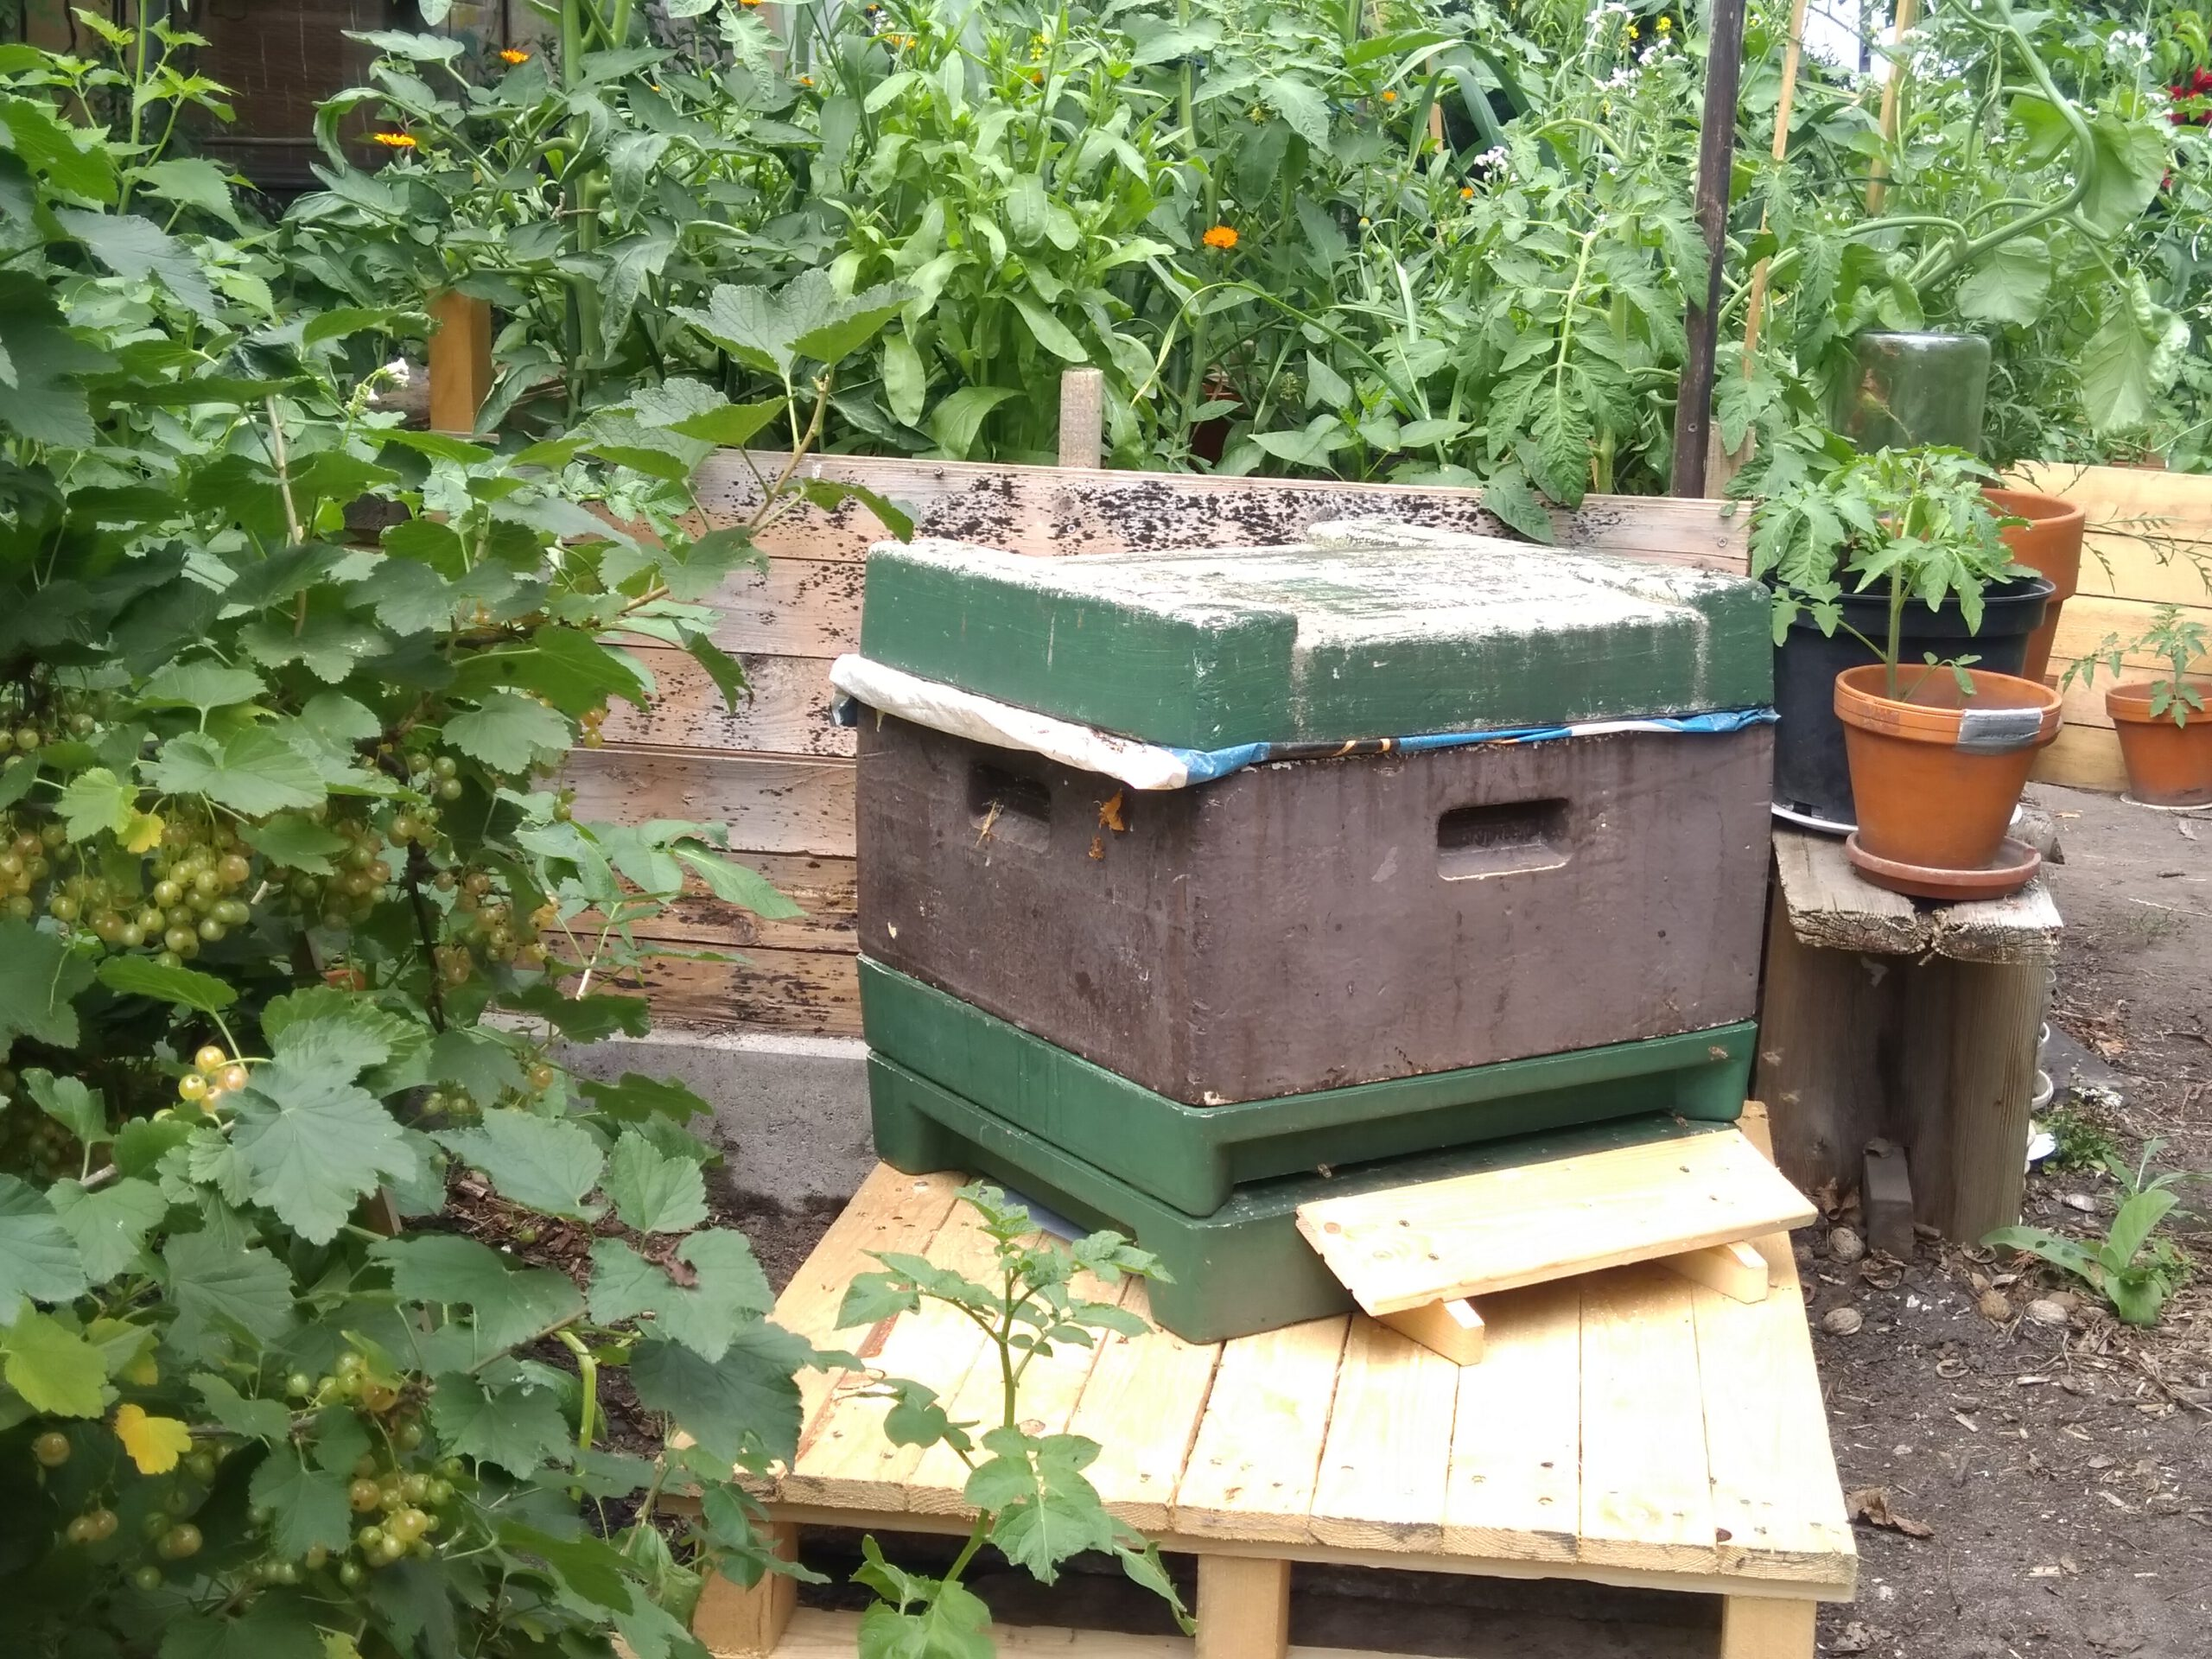 Bienenableger in der Styroporbeute